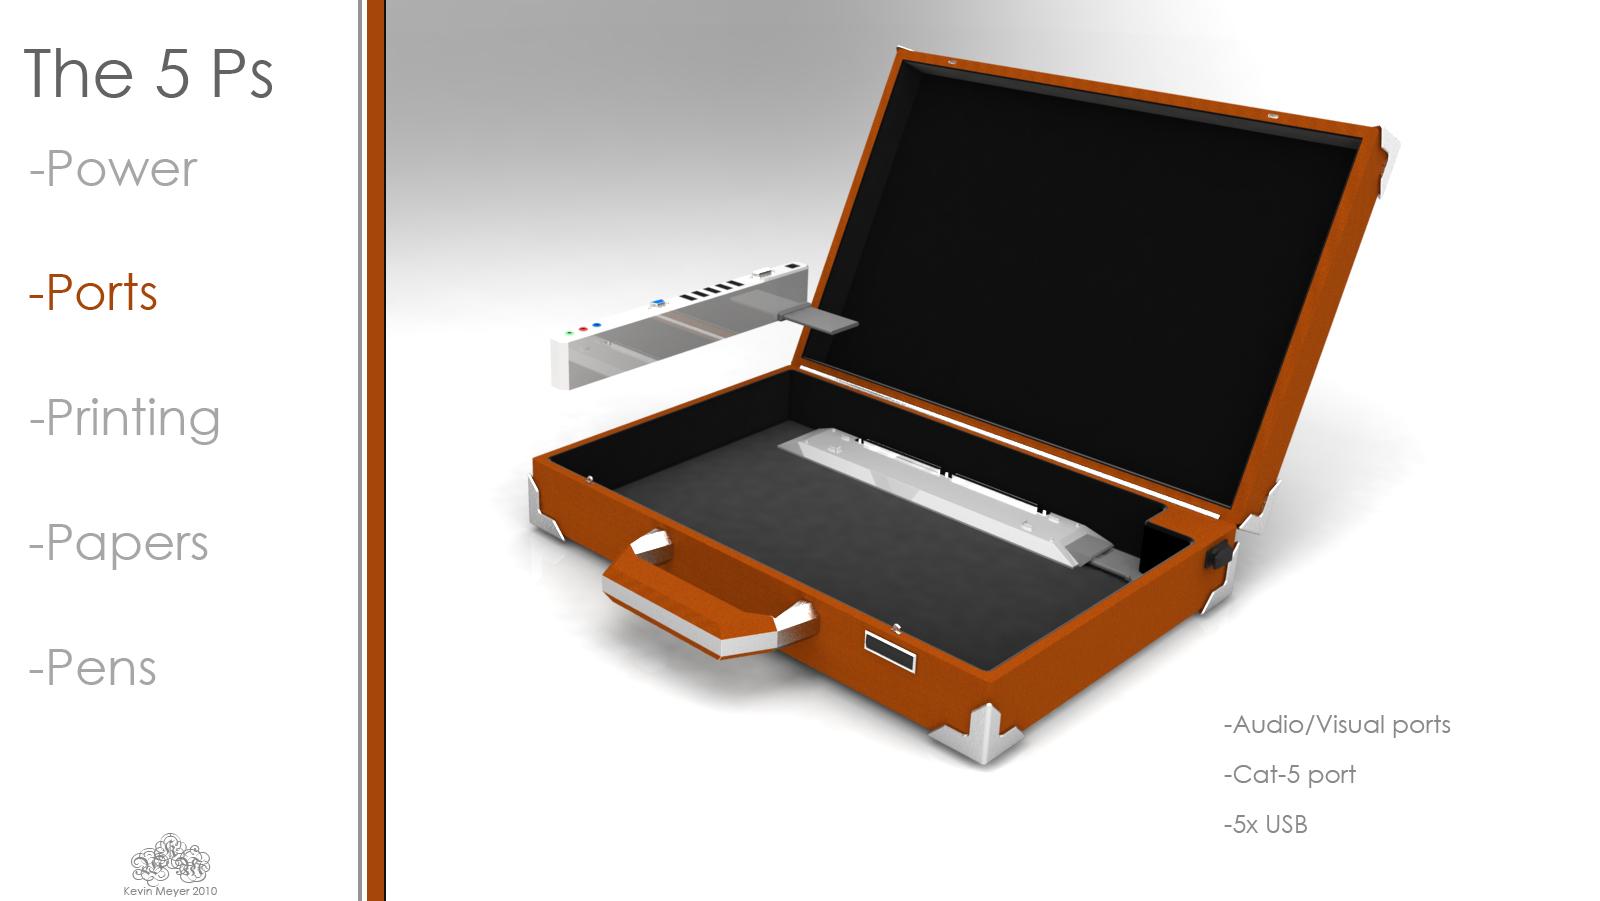 Briefcase Design Project | Kevin Meyer